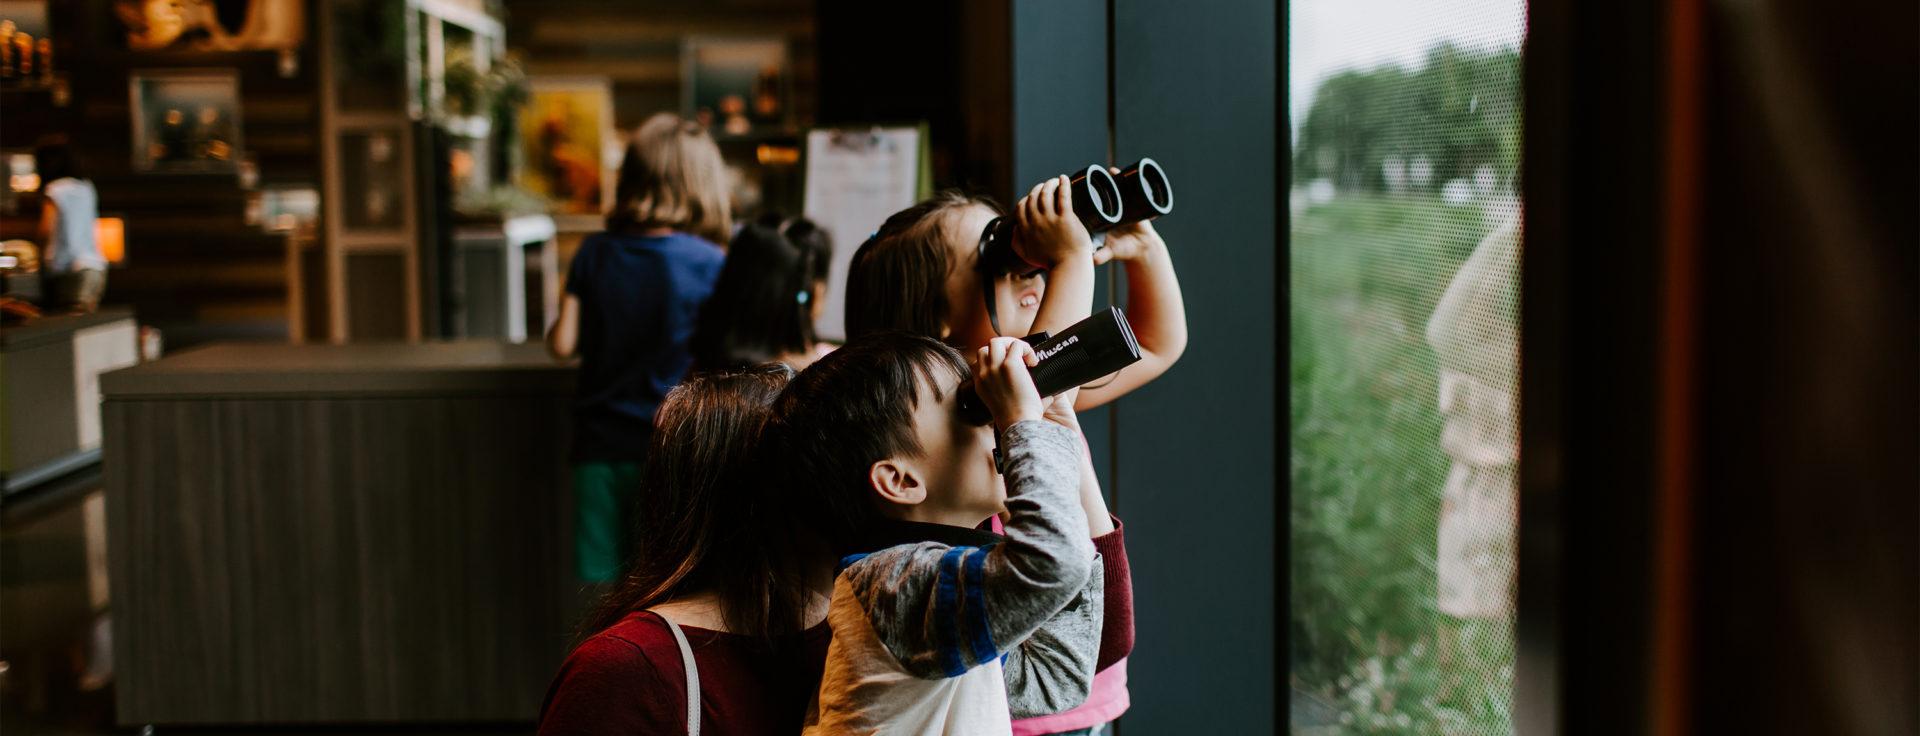 children look through binoculars out a window